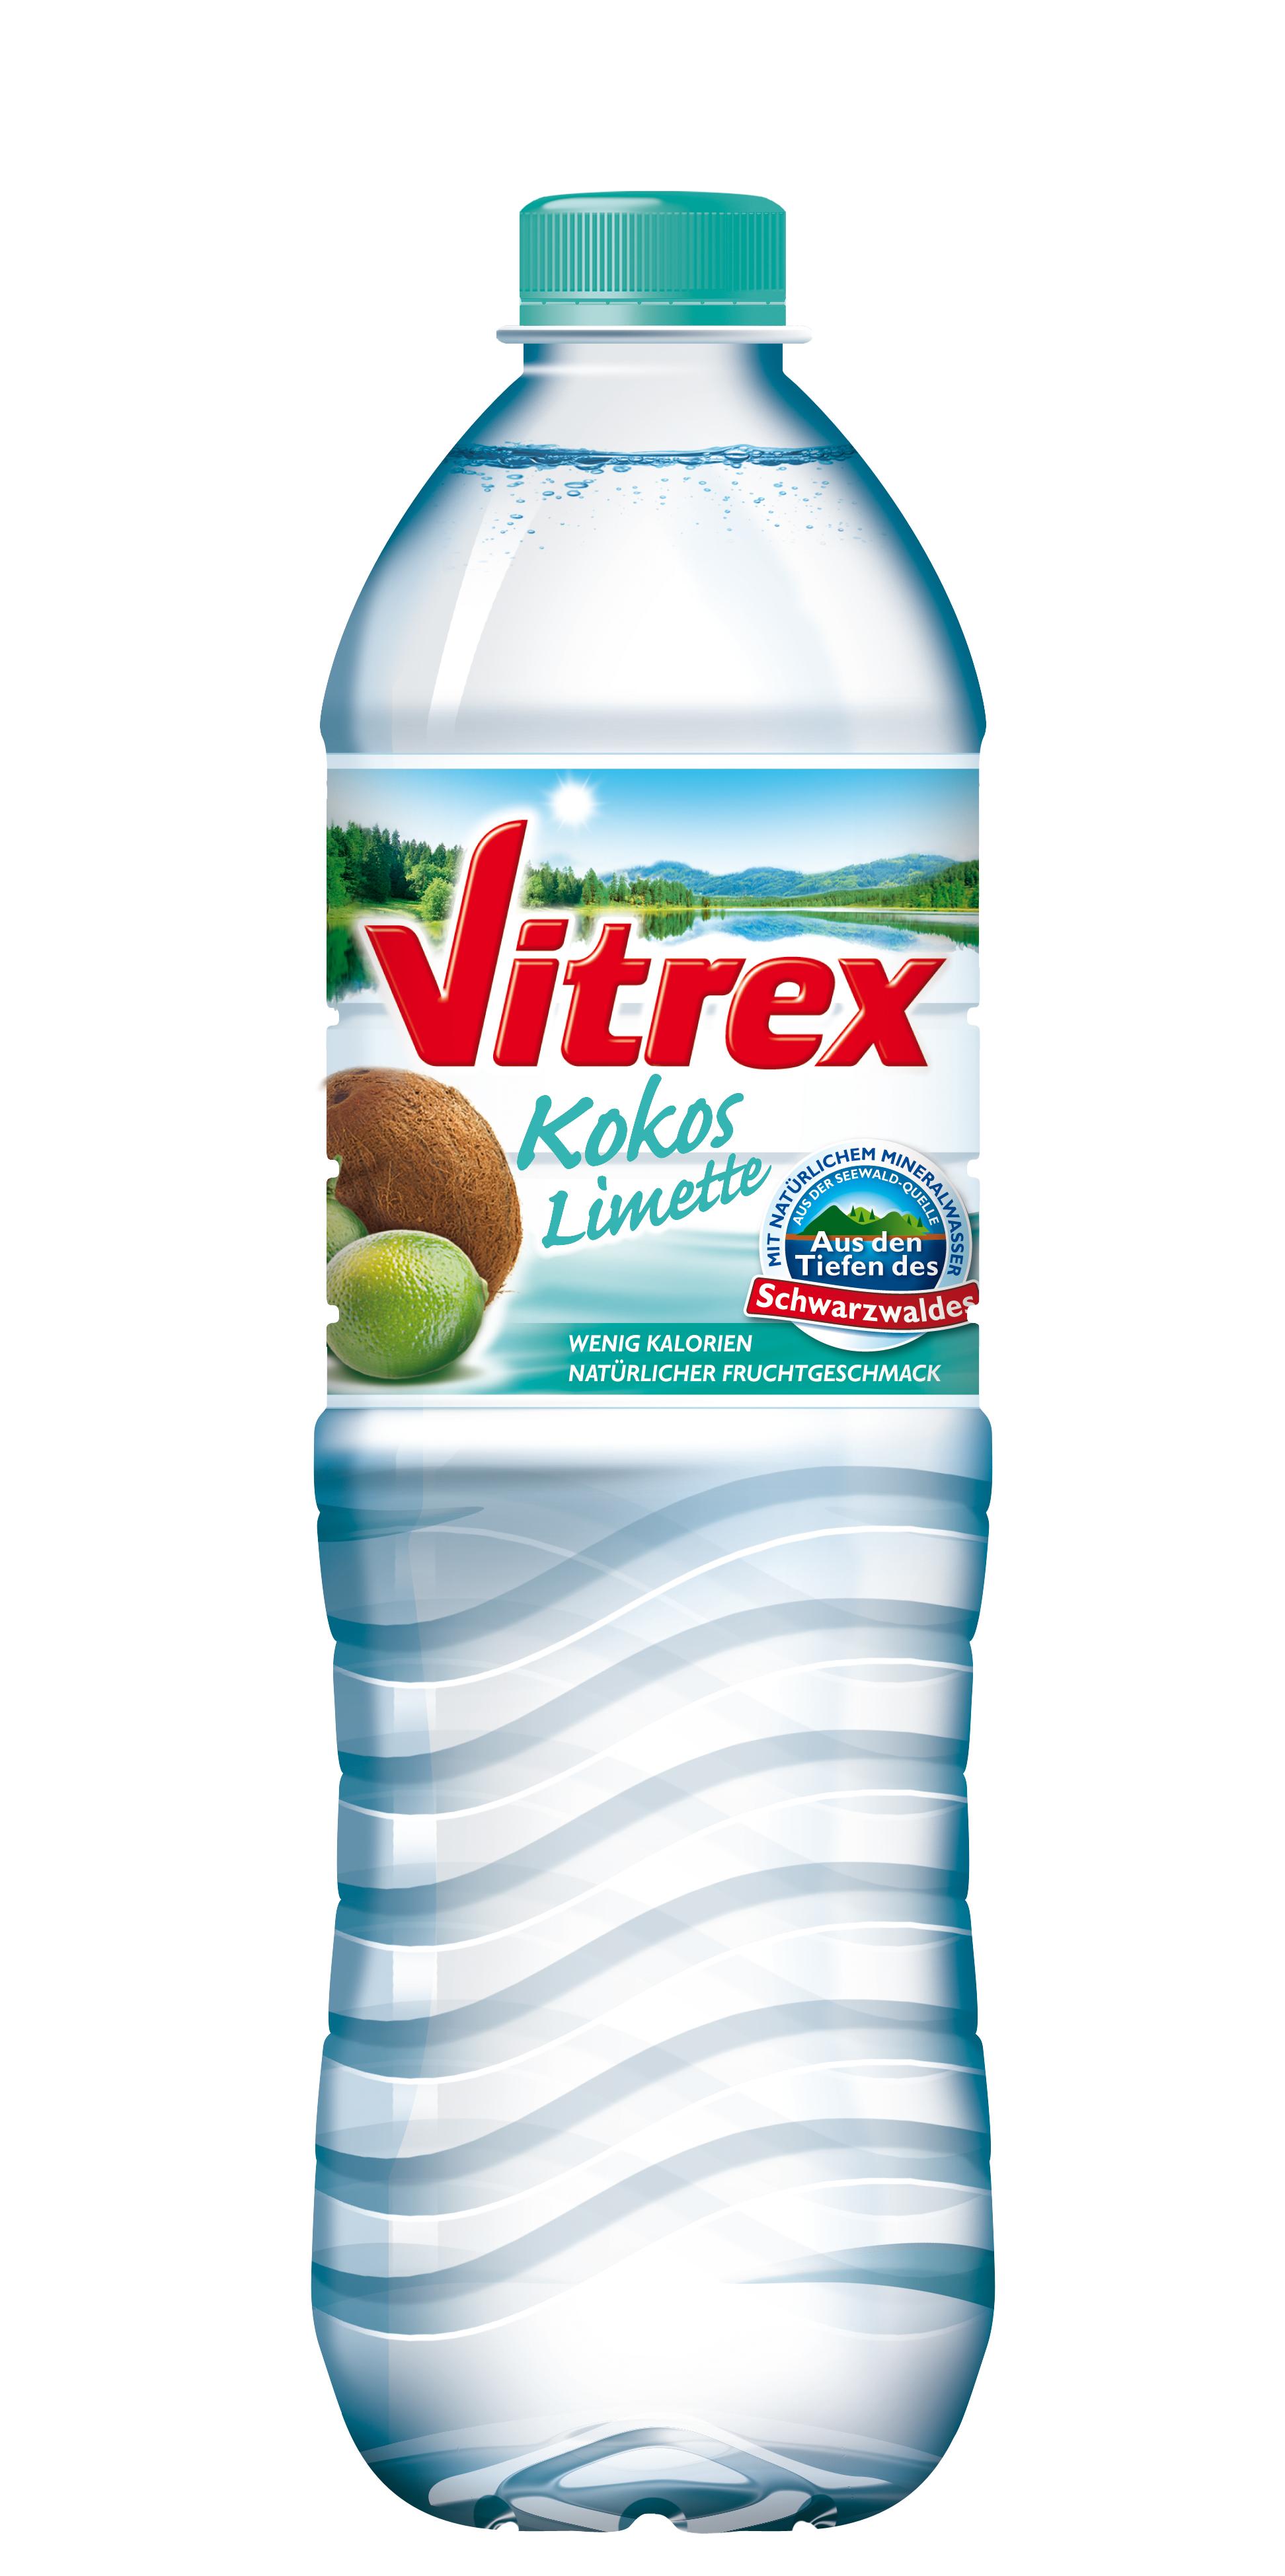 Vitrex Kokos-Limette 1,5 l (2 Stück) Schwarzwald-Sprudel GmbH ...